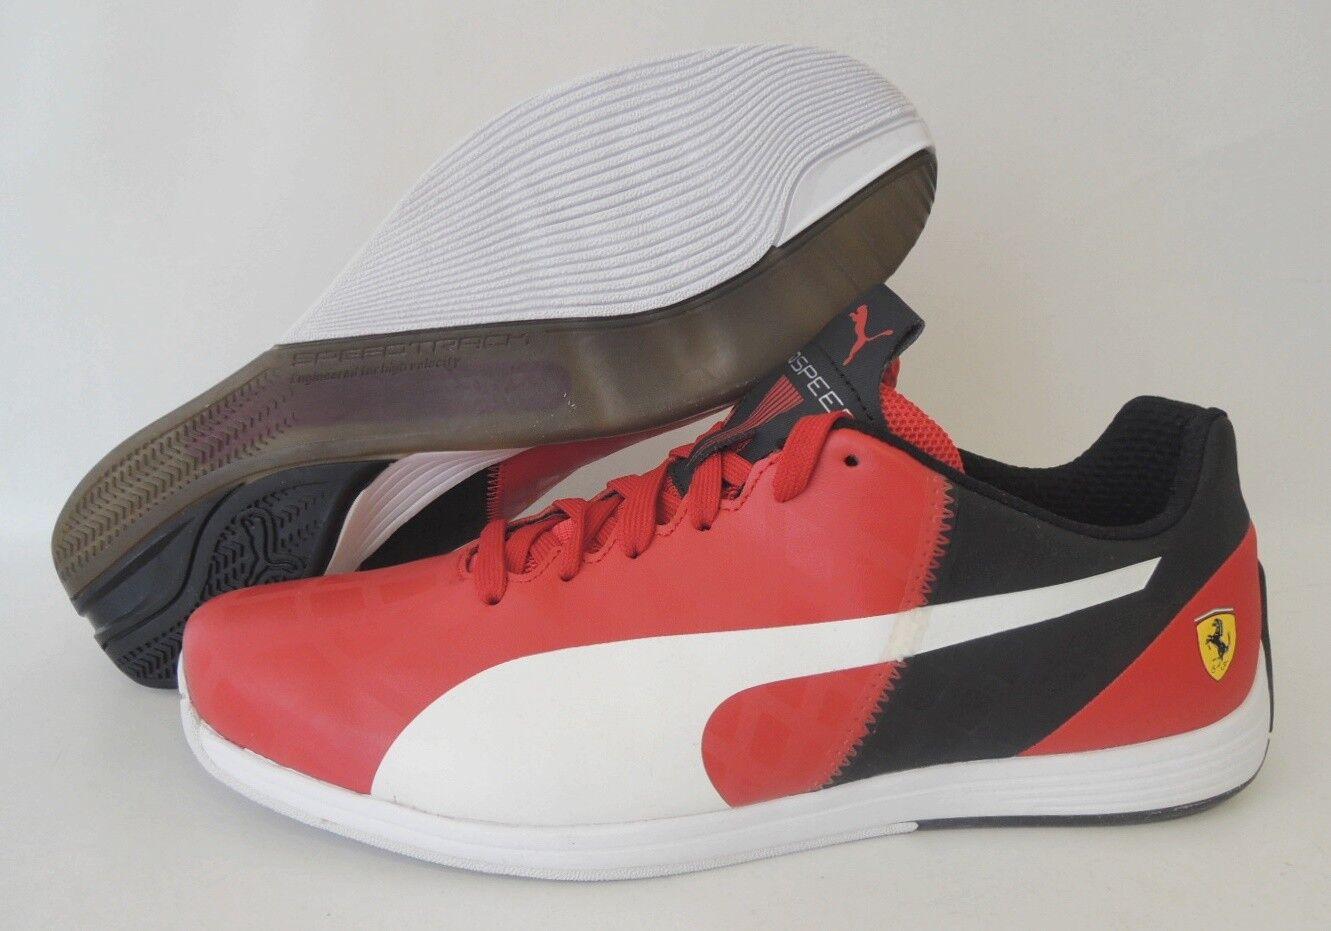 NEU Puma Herren evoSPEED 1.4 SF Ferrari Größe 40,5 Sneaker Herren Puma Schuhe 305555-02 ROT 6bed03